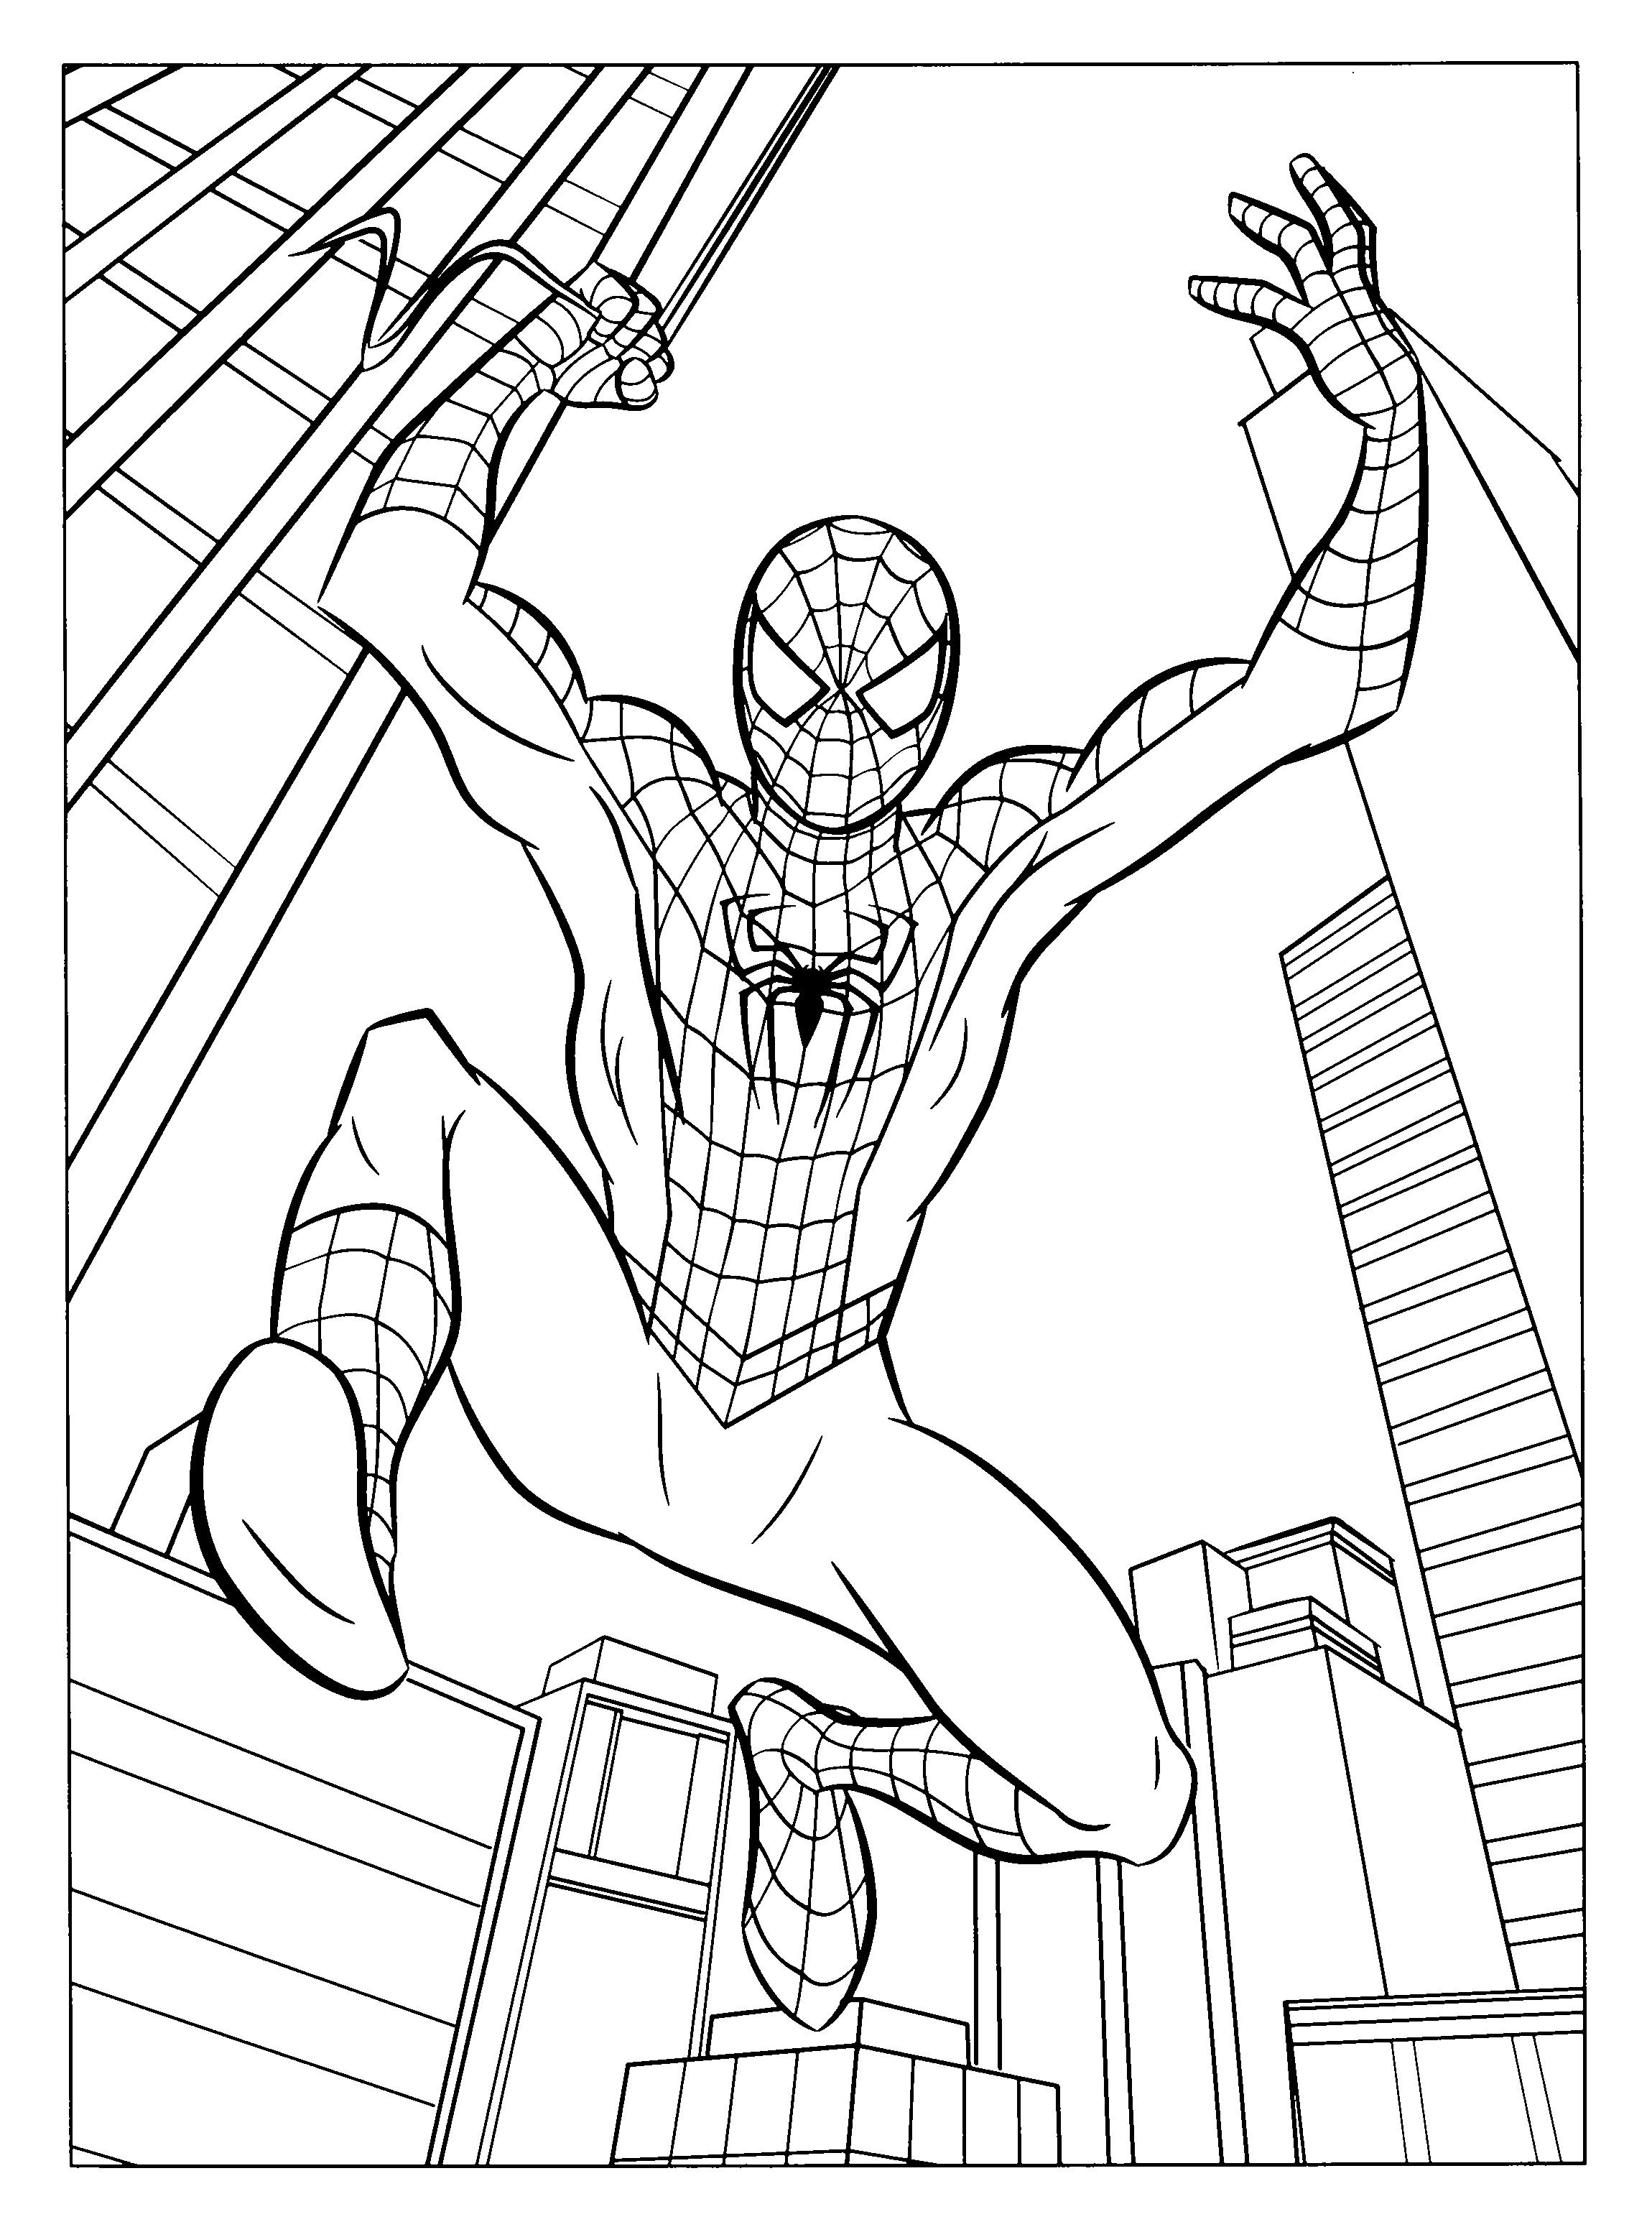 Spiderman 78640 Superheroes Printable Coloring Pages